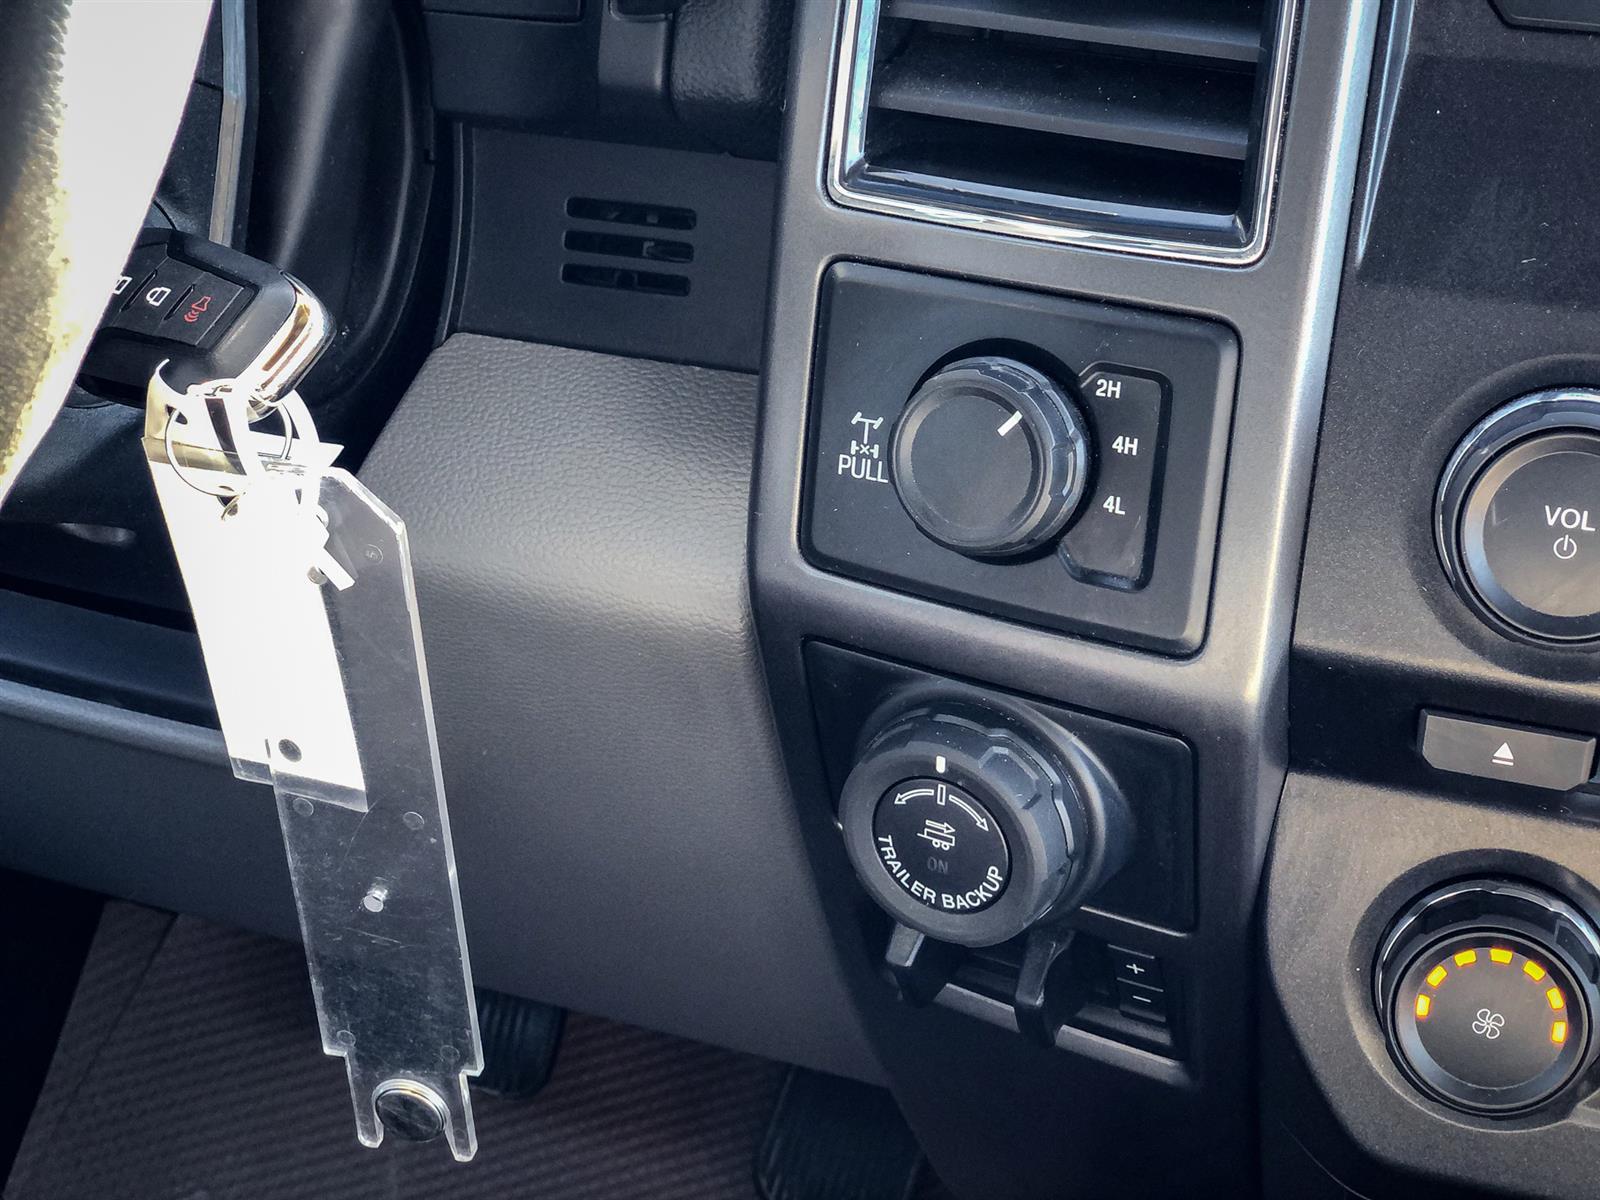 2018 Ford F-150 XLT |2.7L V6 ECOBOOST | 4X4 | SUPERCAB | REAR CAMERA